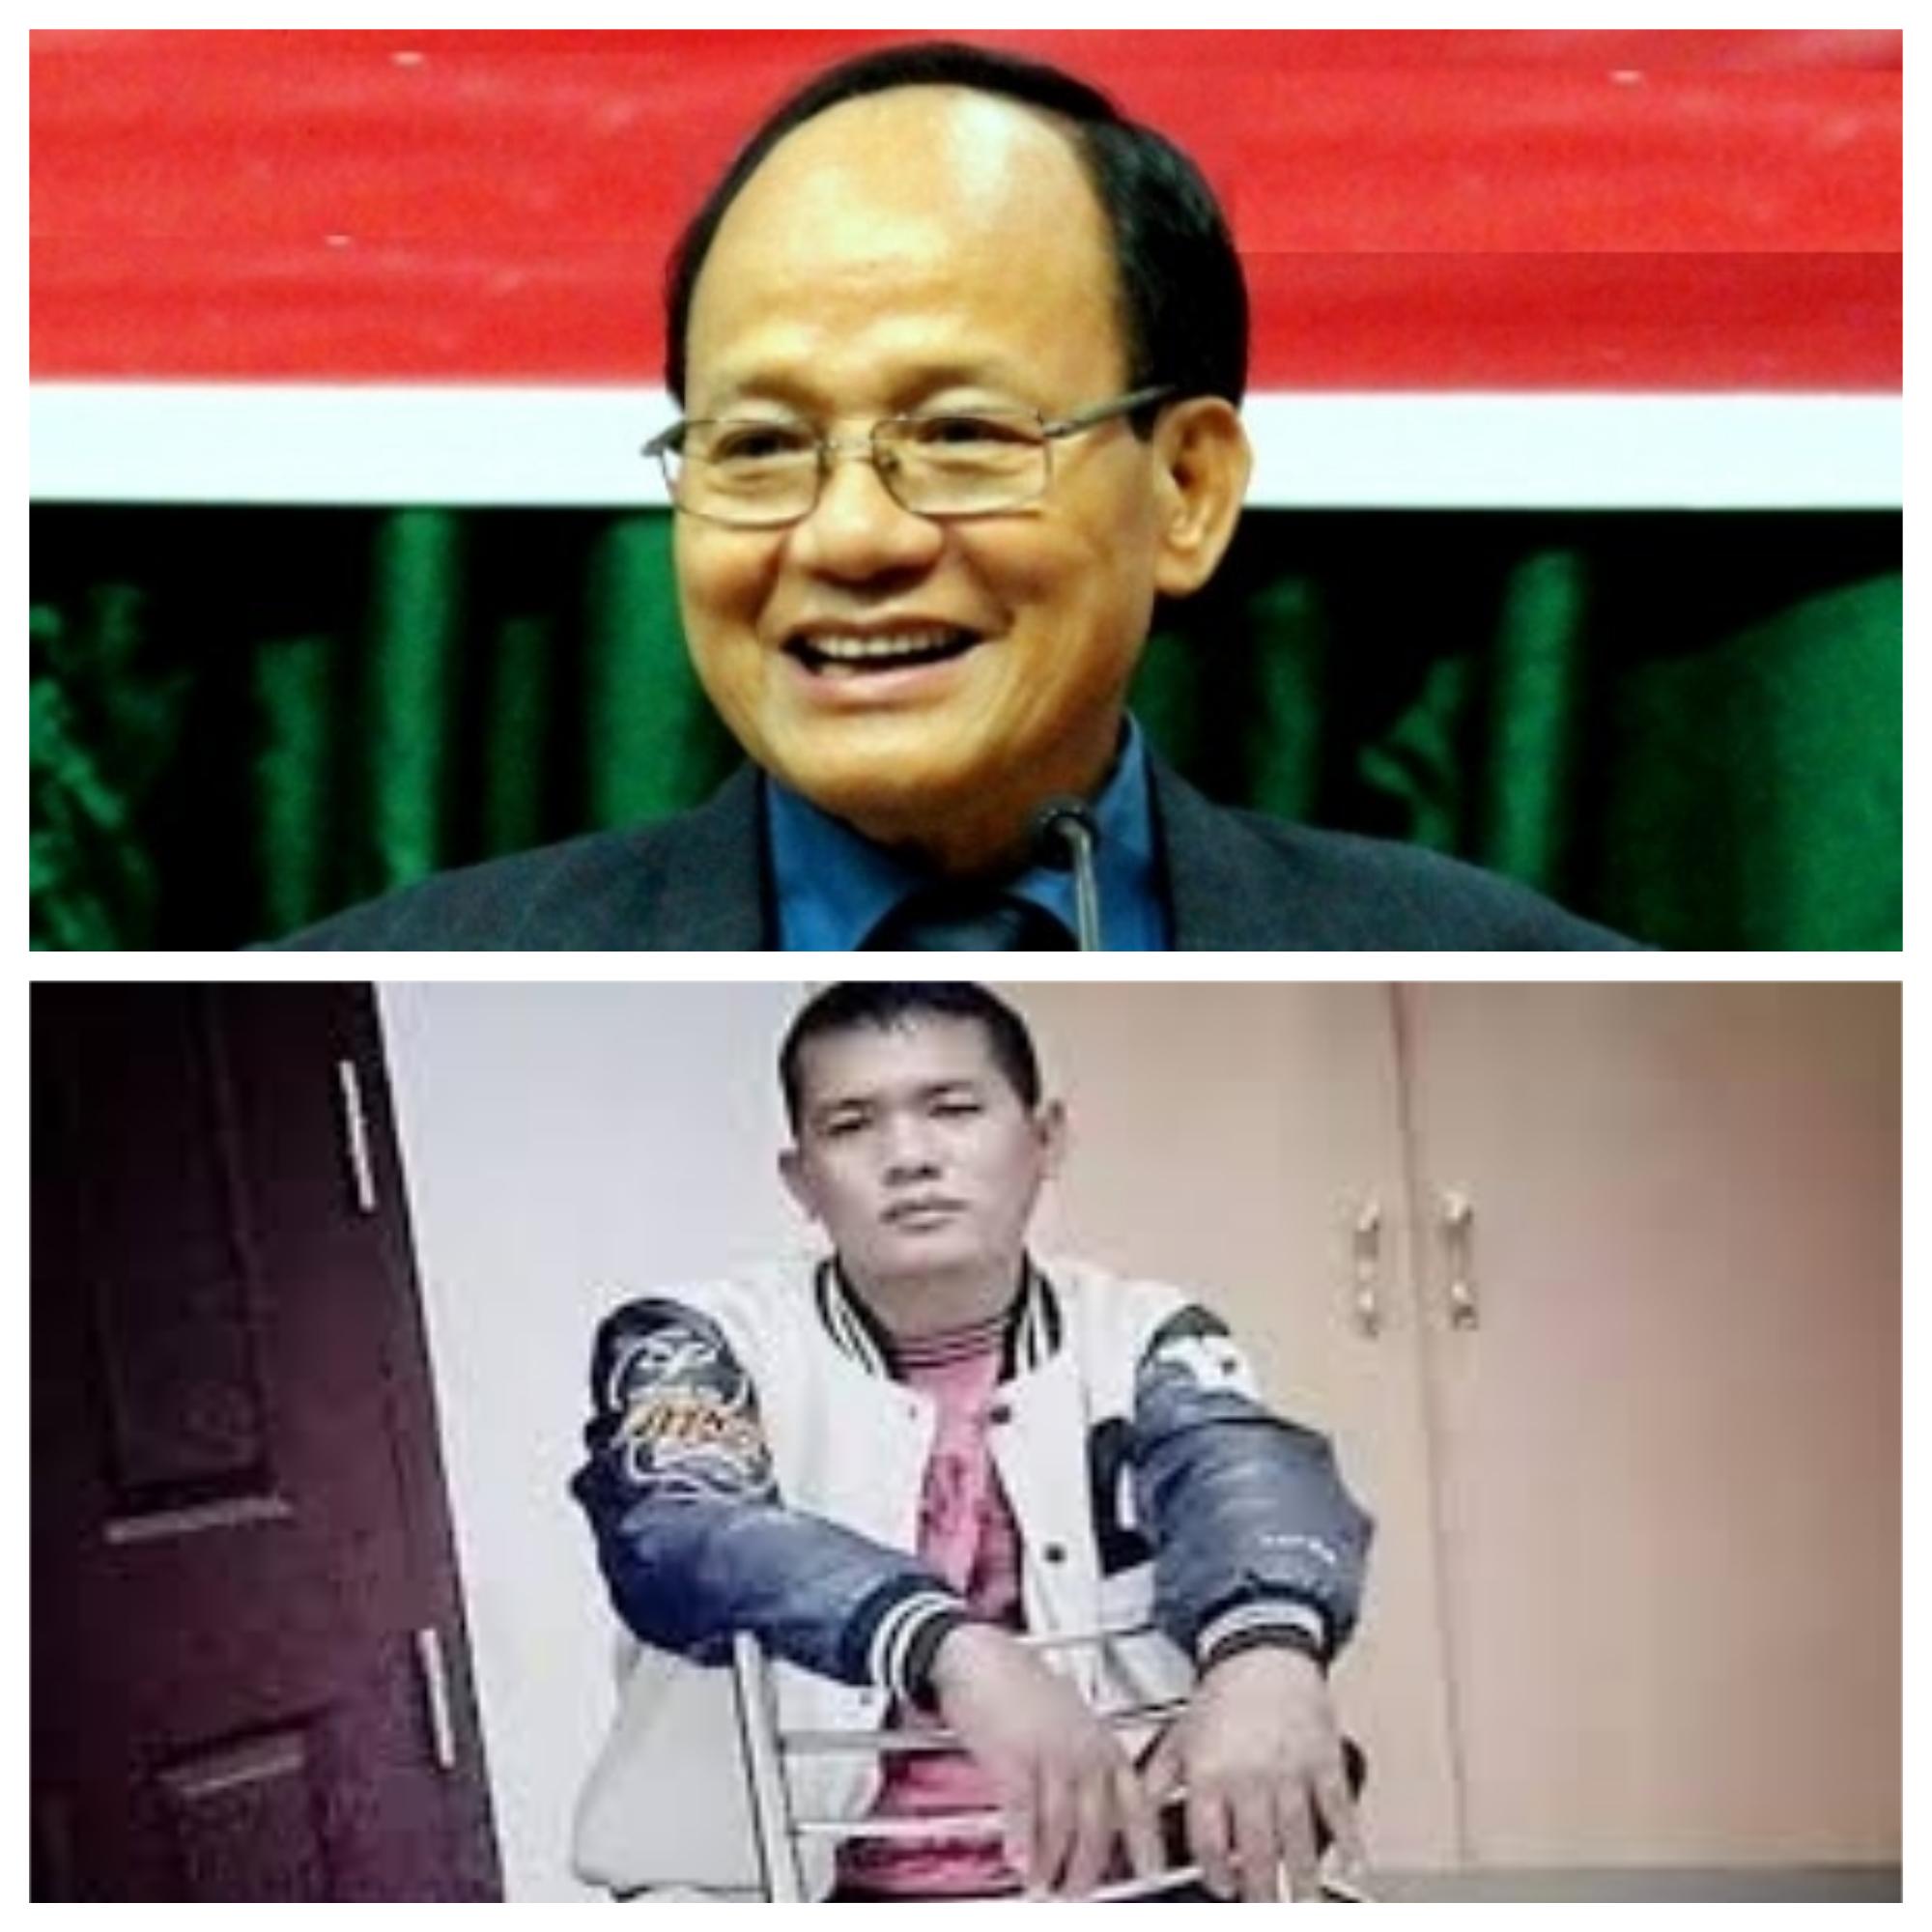 FIR Filed Against Mizoram Home Minister R Lalzirliana